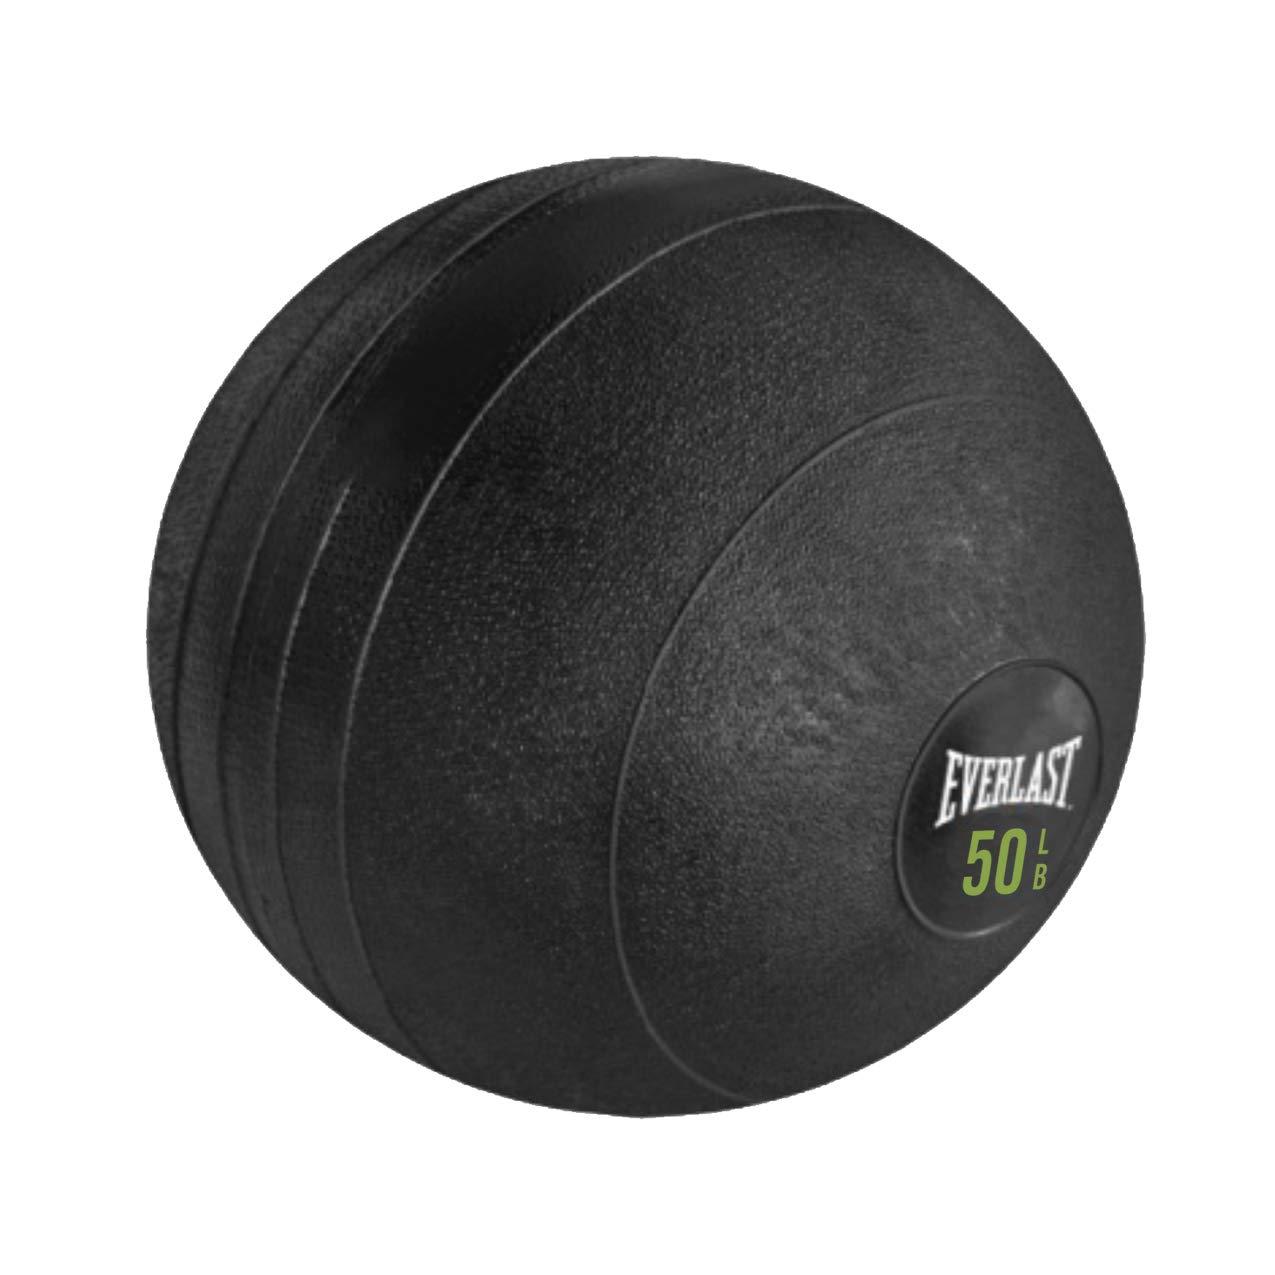 Everlast 50lb Flex Slam Ball Flex Slam Ball